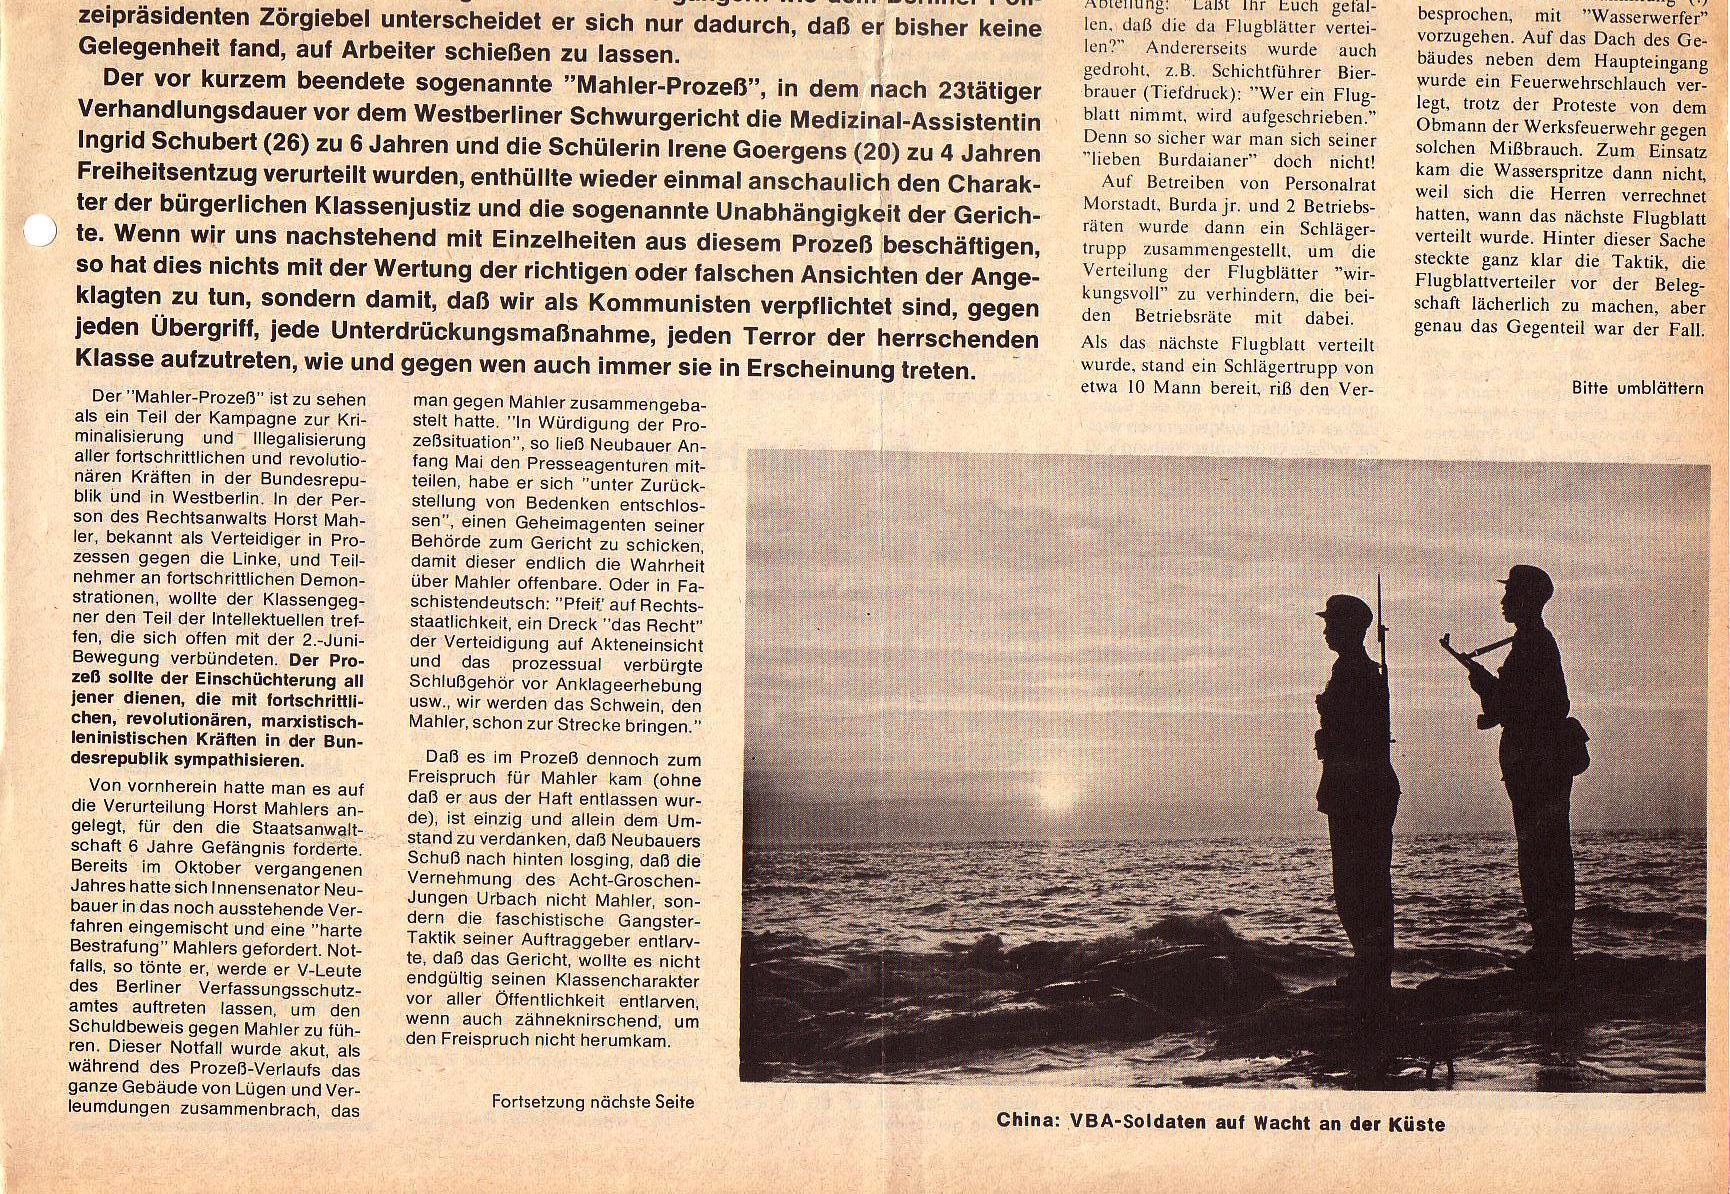 Roter Morgen, 5. Jg., Juni 1971, Nr. 6, Seite 1b